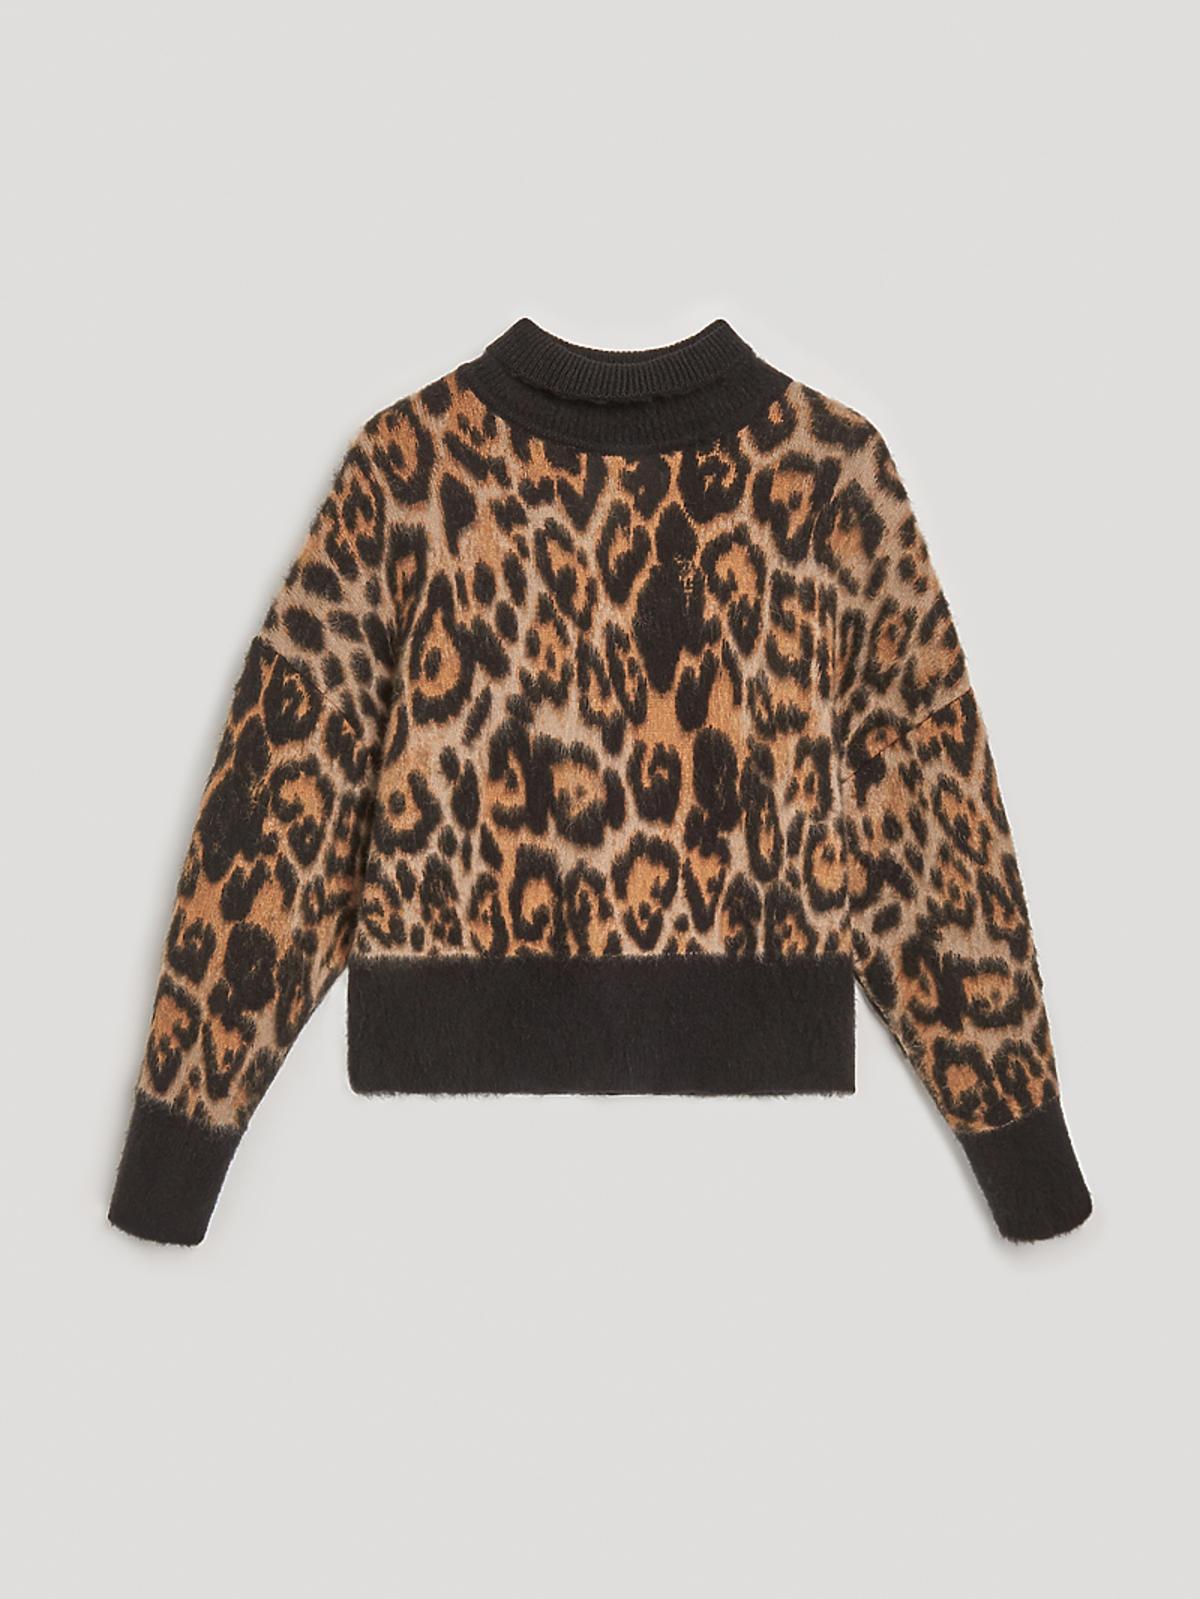 Sweter Reserved cena 199 zł